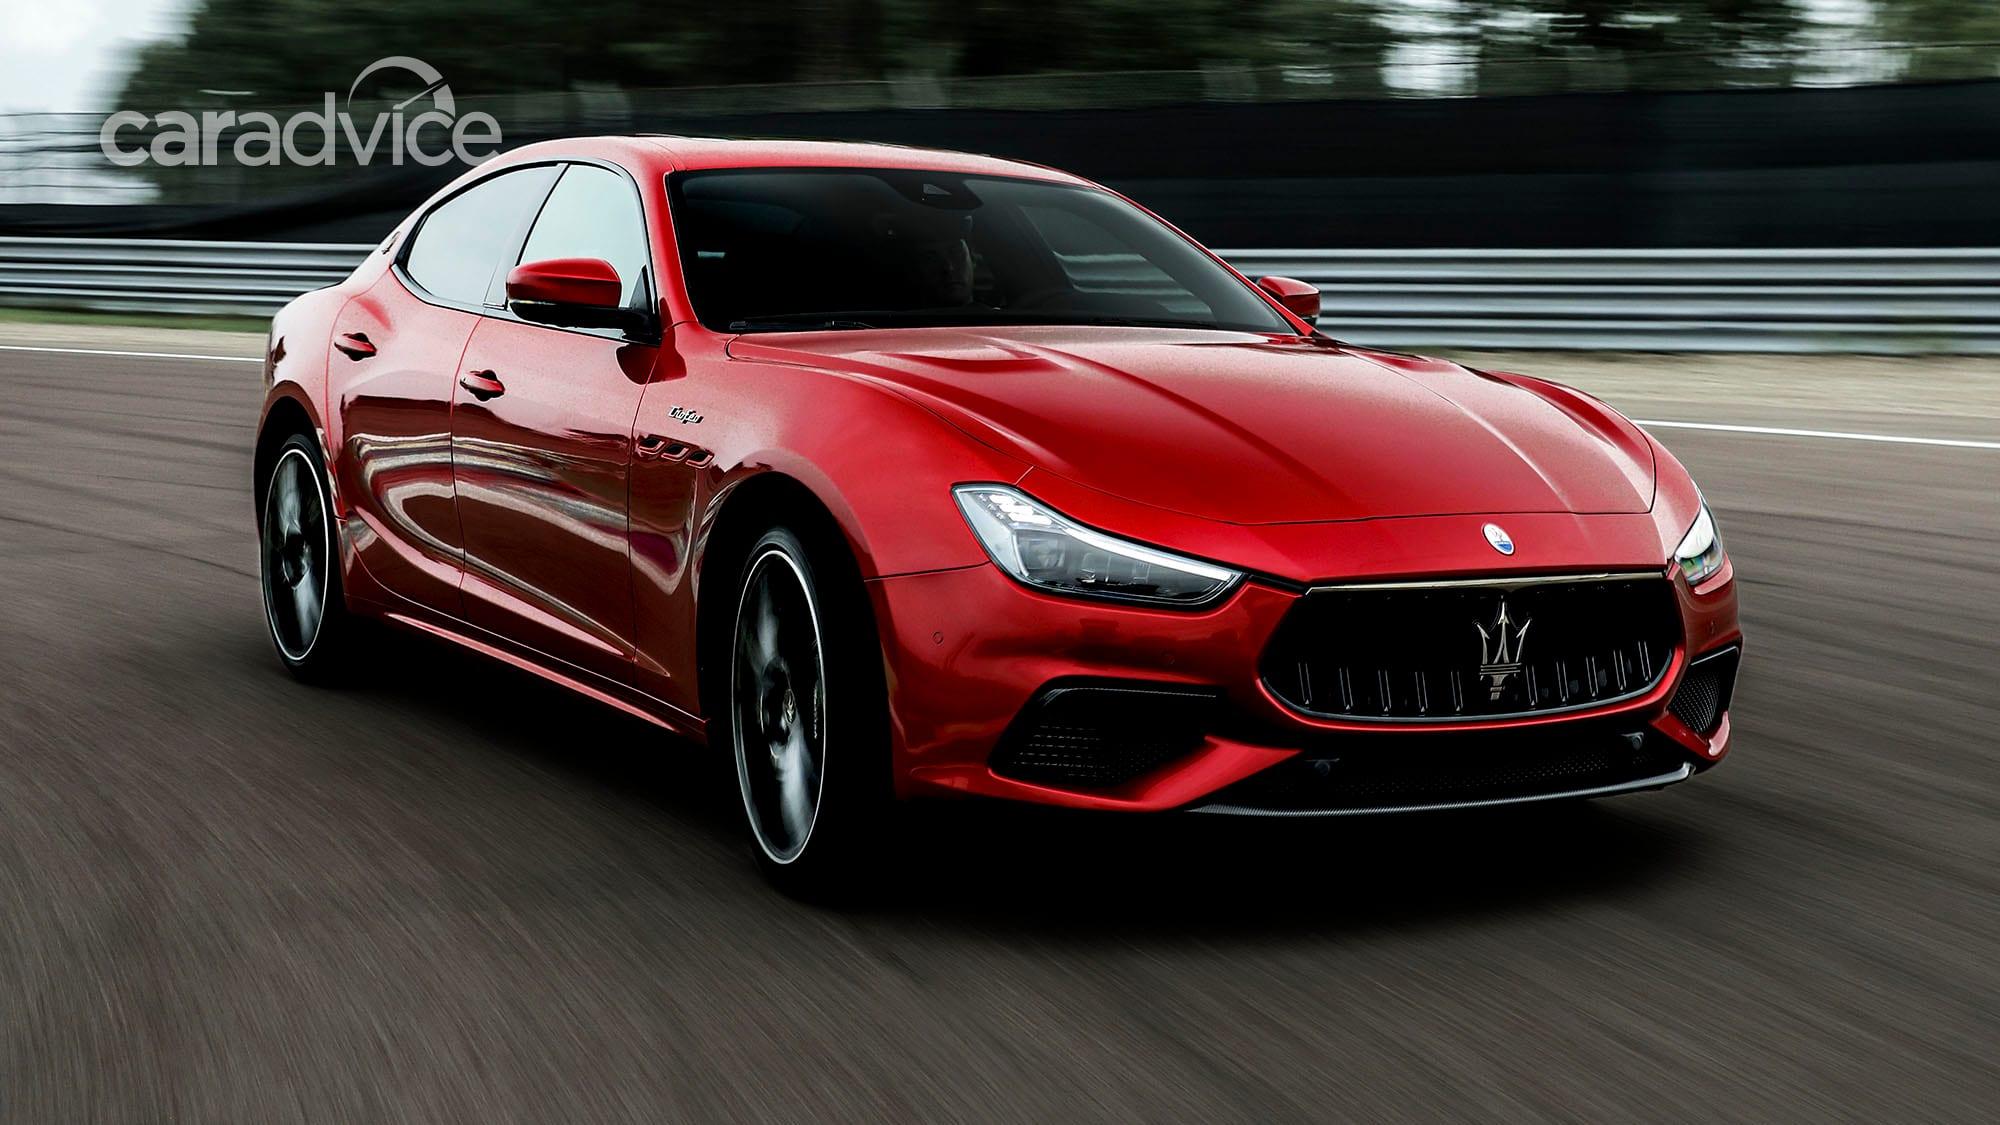 2021 Maserati Ghibli Trofeo, Quattroporte Trofeo revealed | CarAdvice